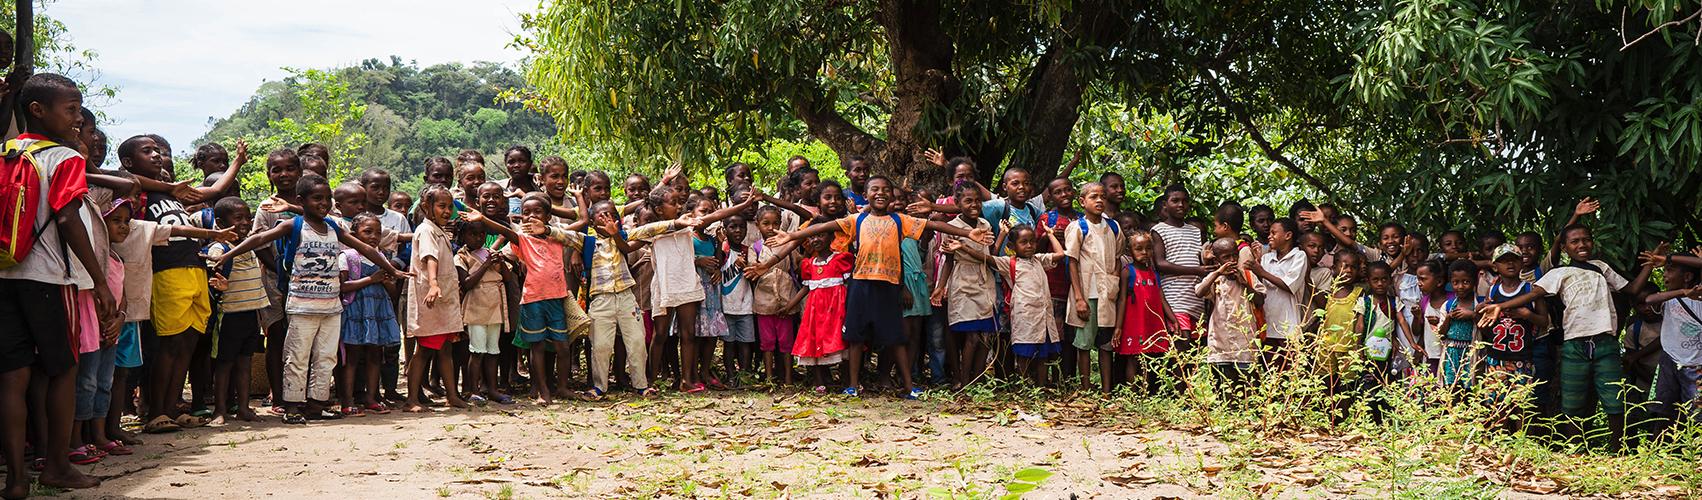 Schoolchildren during a presentation led by DLC-SAVA